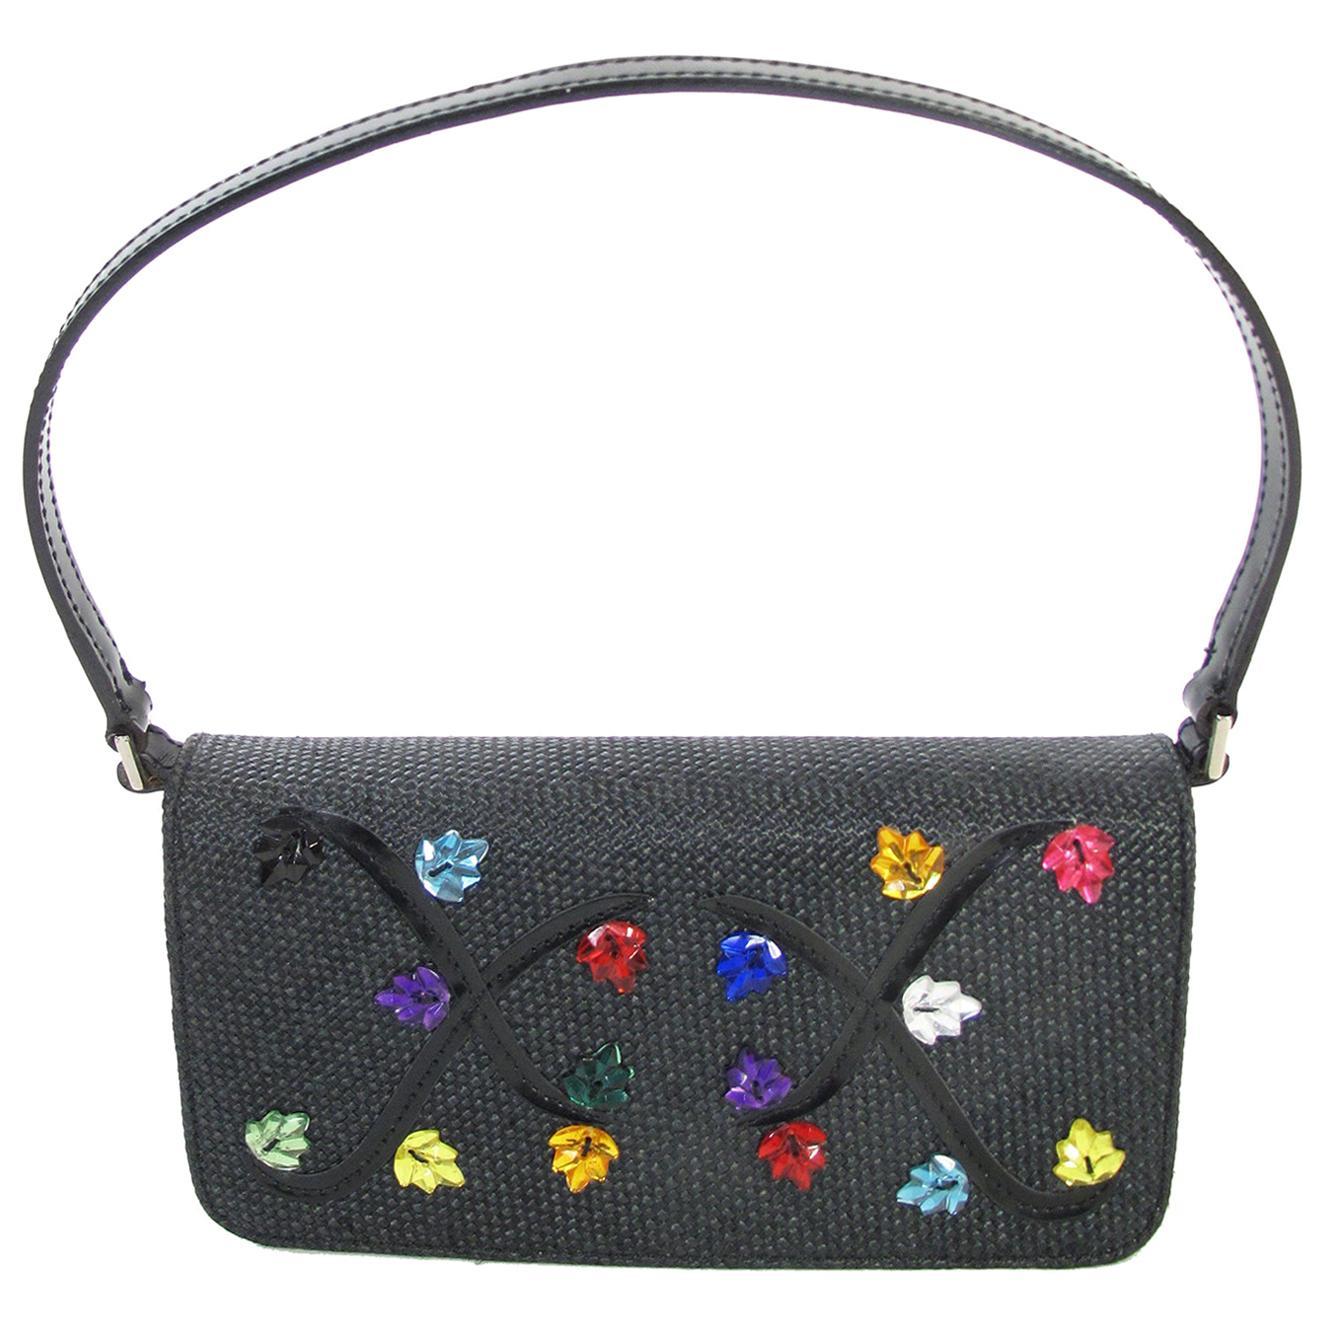 Renaud Pellegrino black raffia mini bag with jewel embellishments